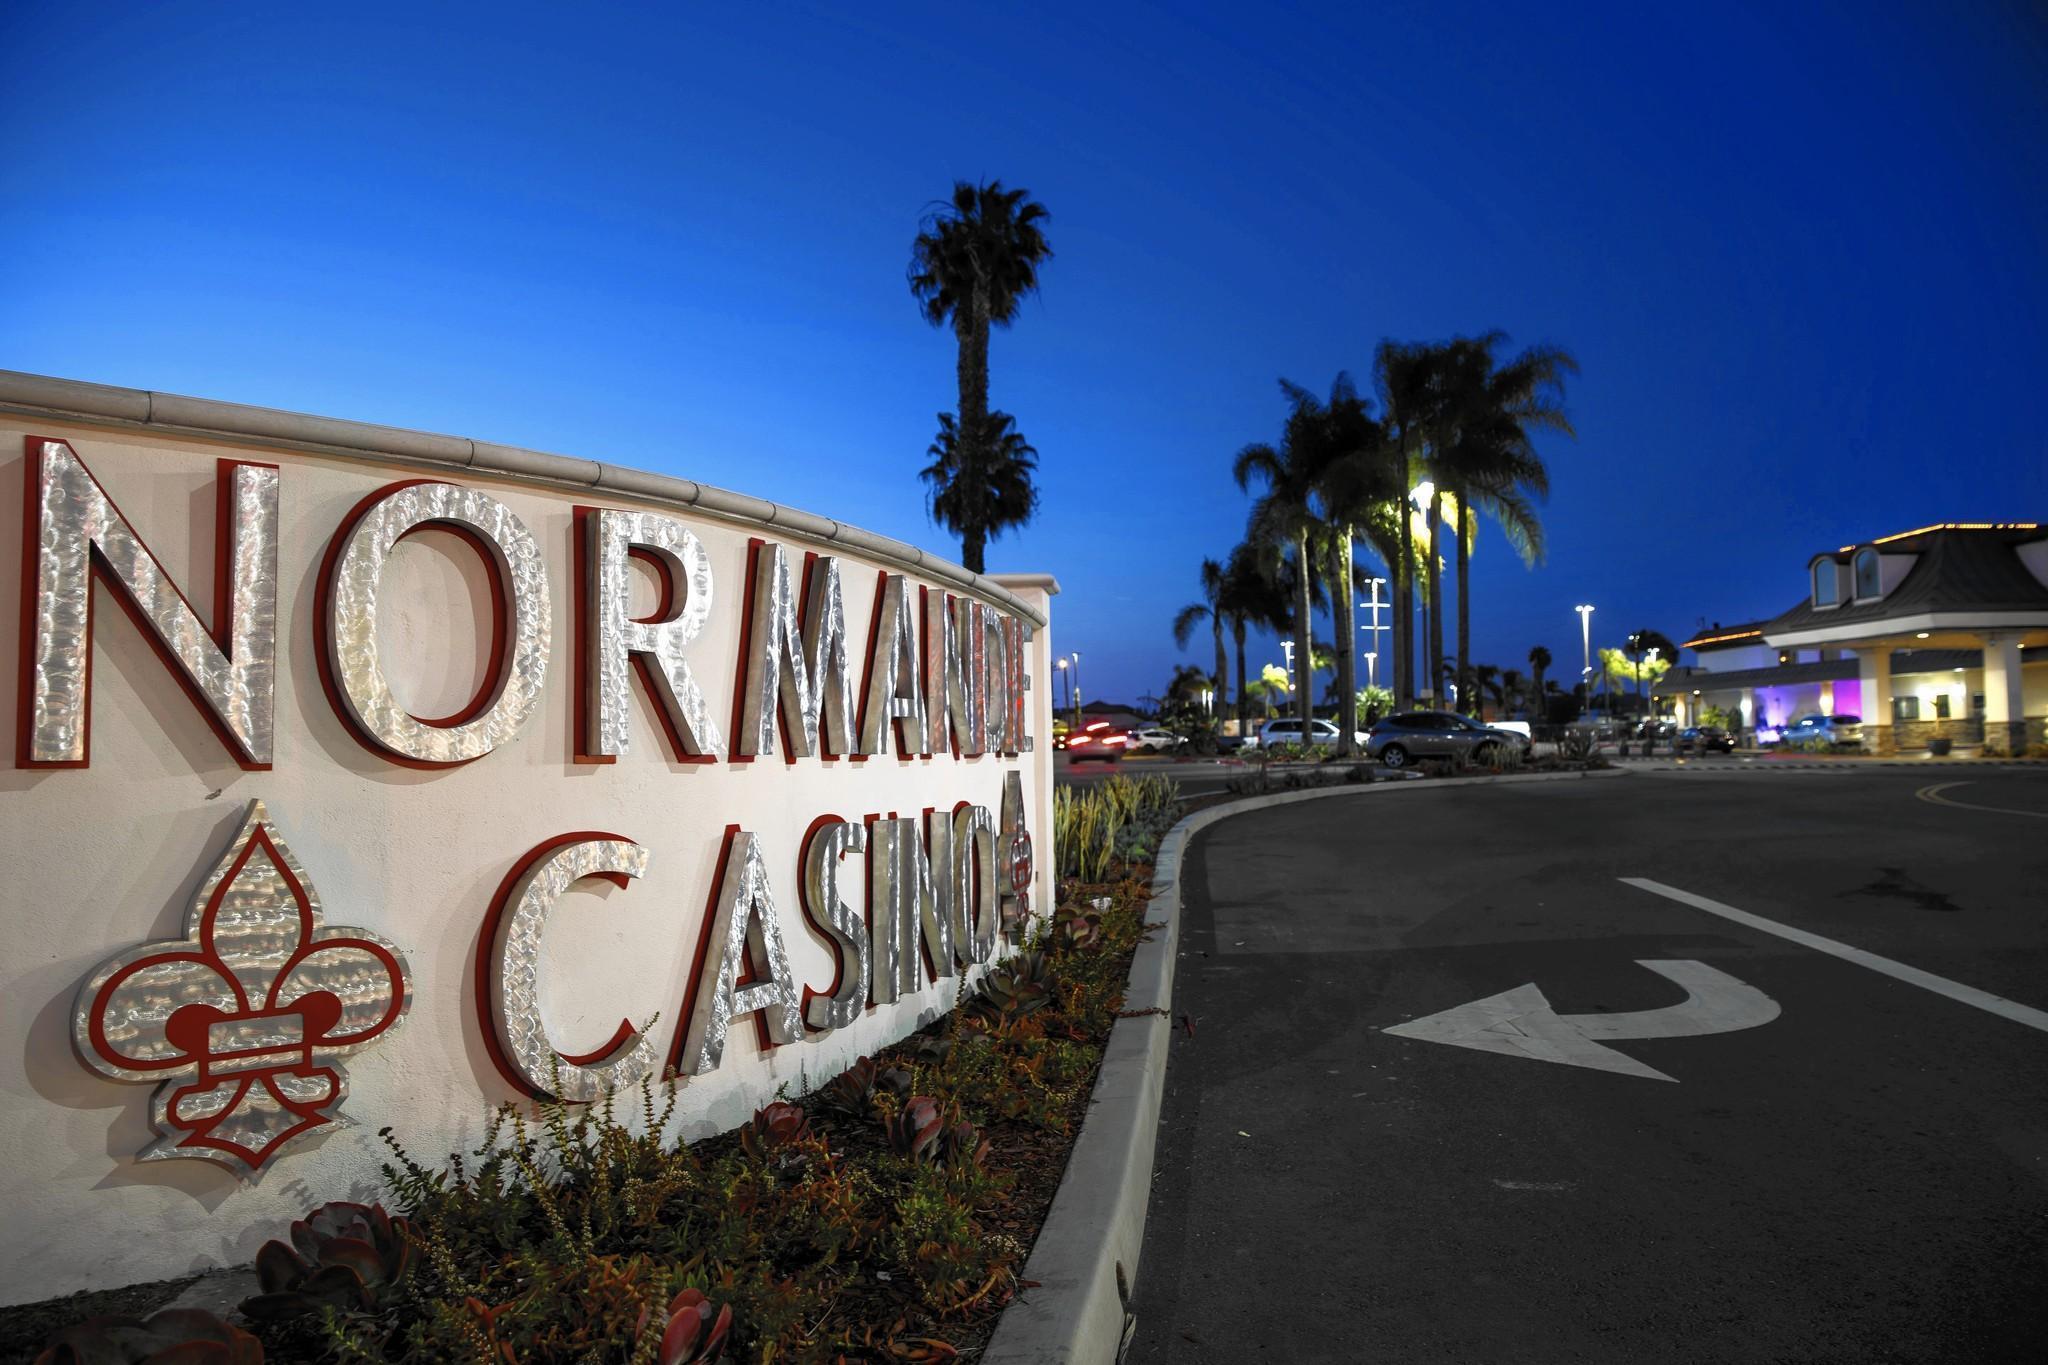 Normandy casino los angeles defination of gambling